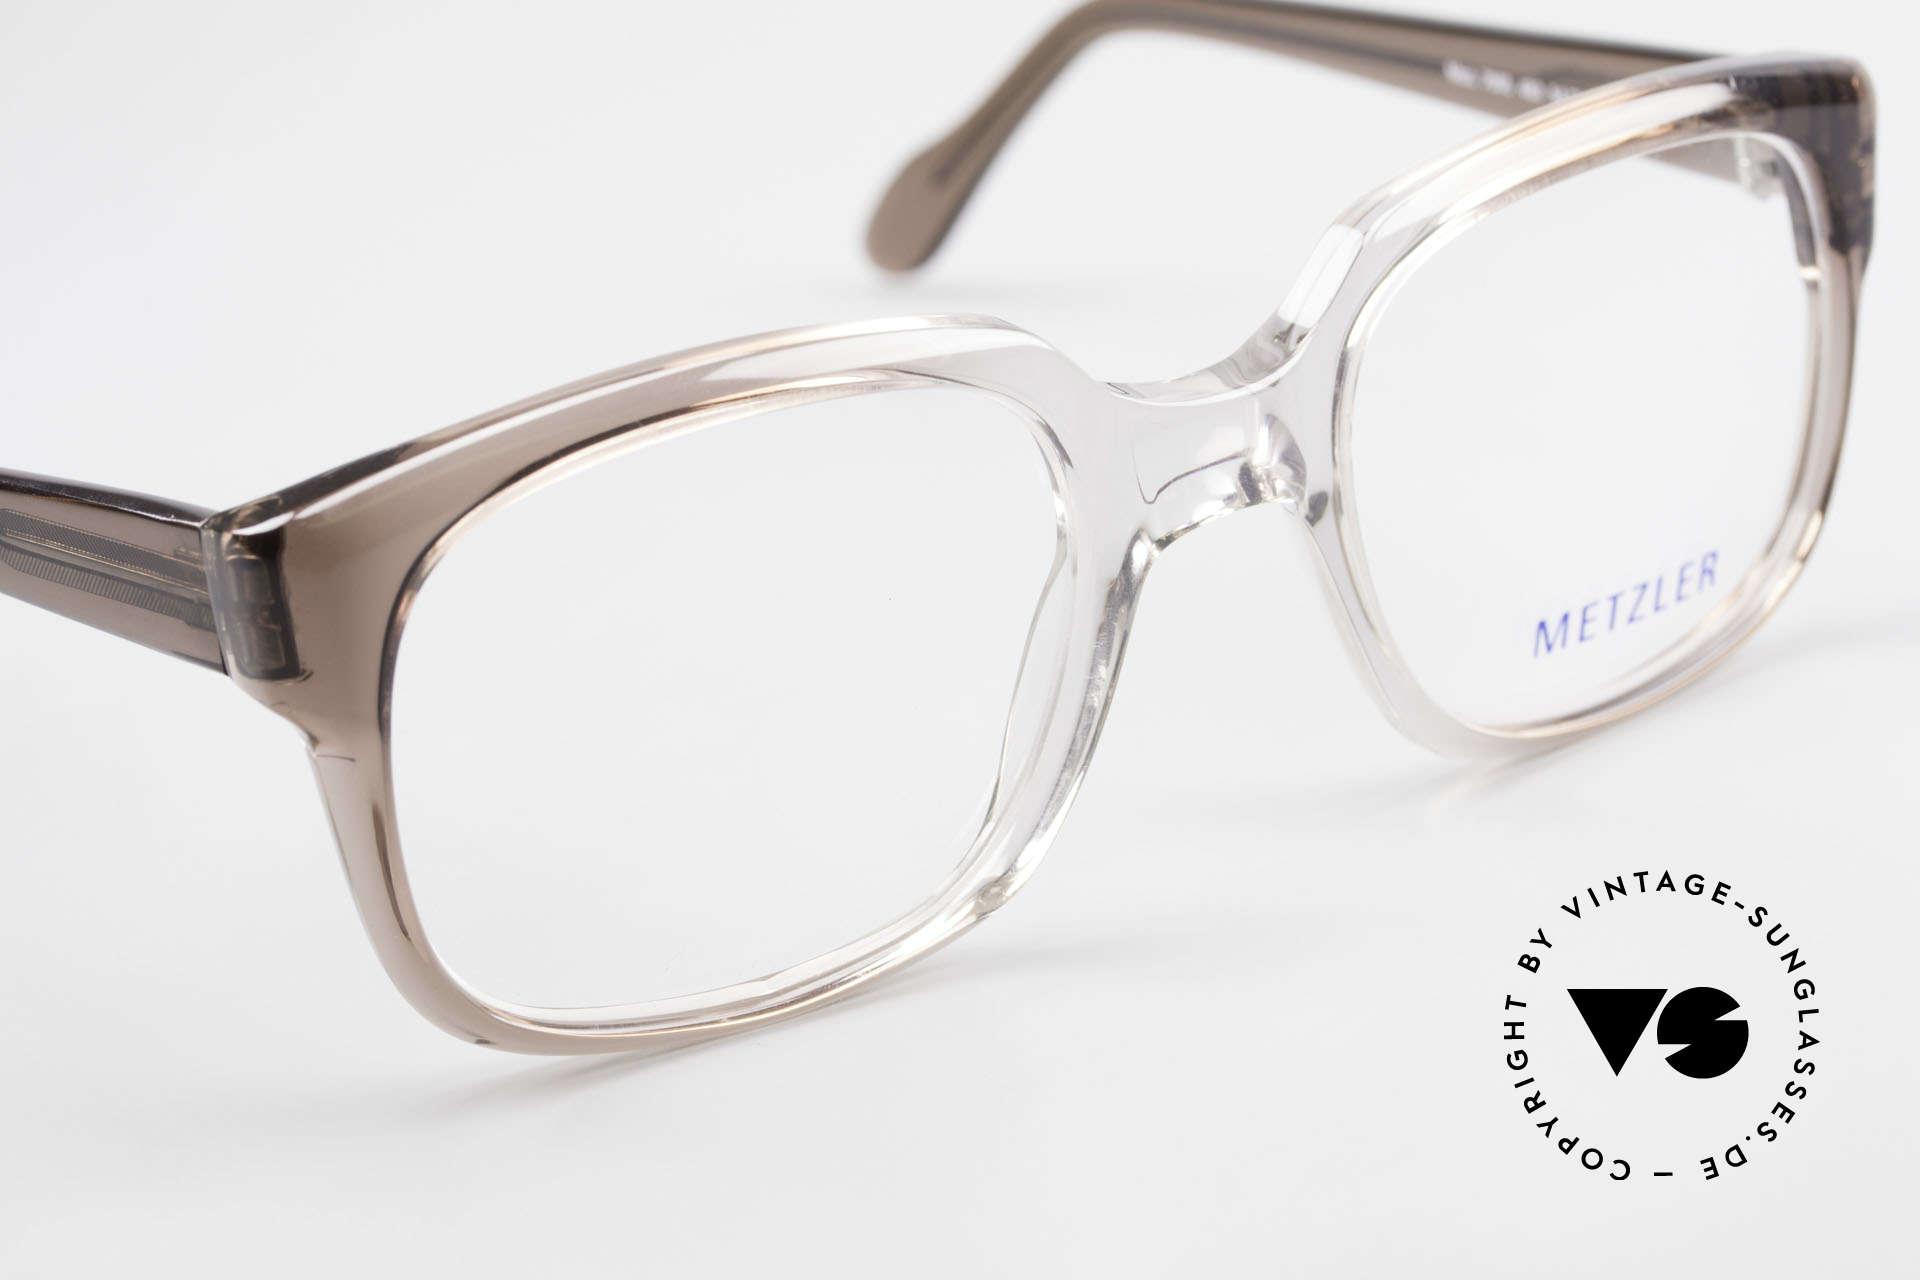 Metzler 7665 Medium Old School Eyeglasses 80's, NO RETRO; but an old 'Made in Germany' original, Made for Men